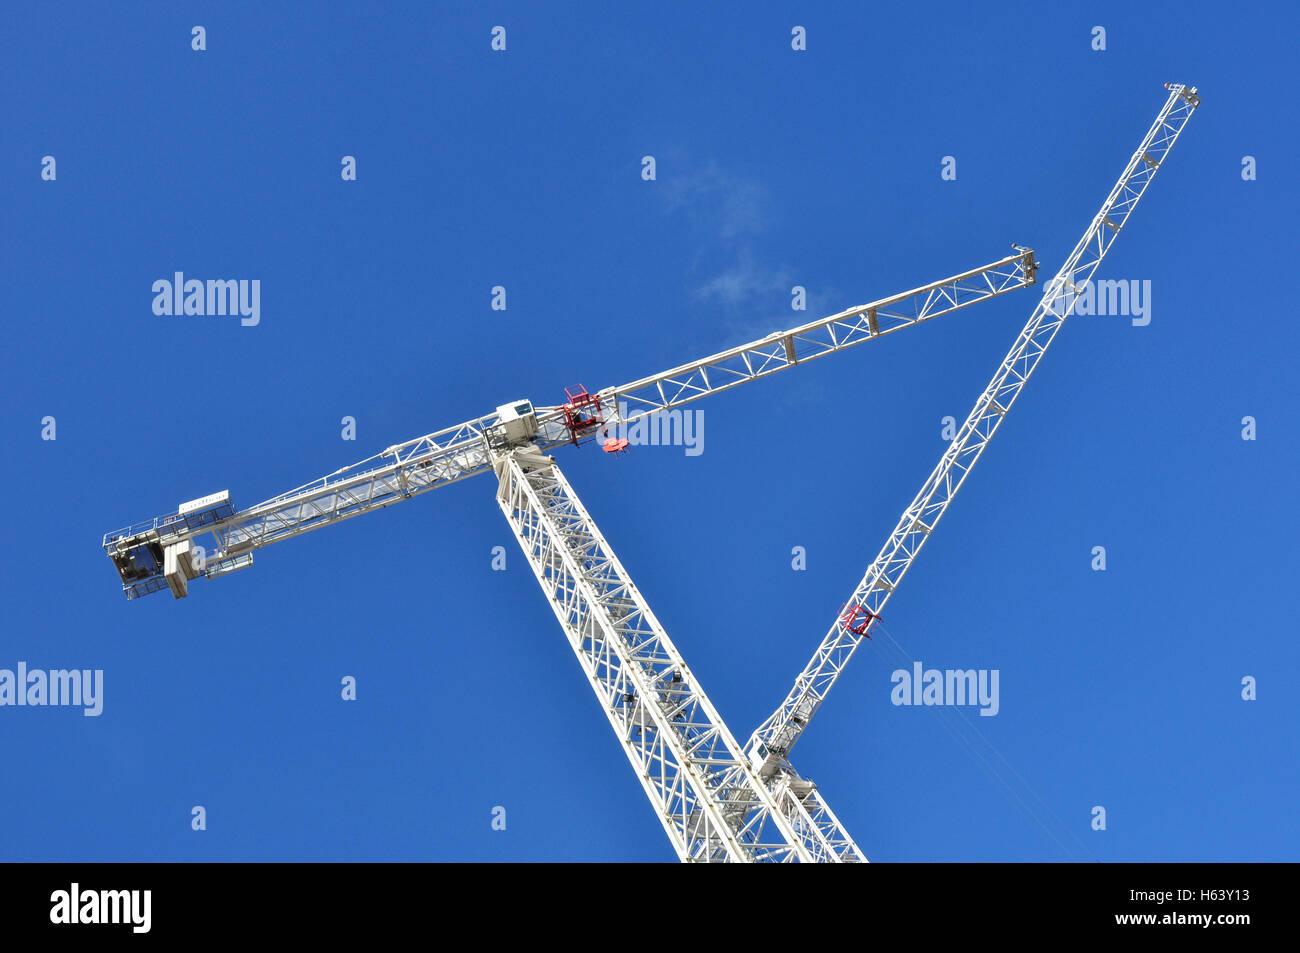 Tower Cranes, King's Cross area, London, England, UK - Stock Image